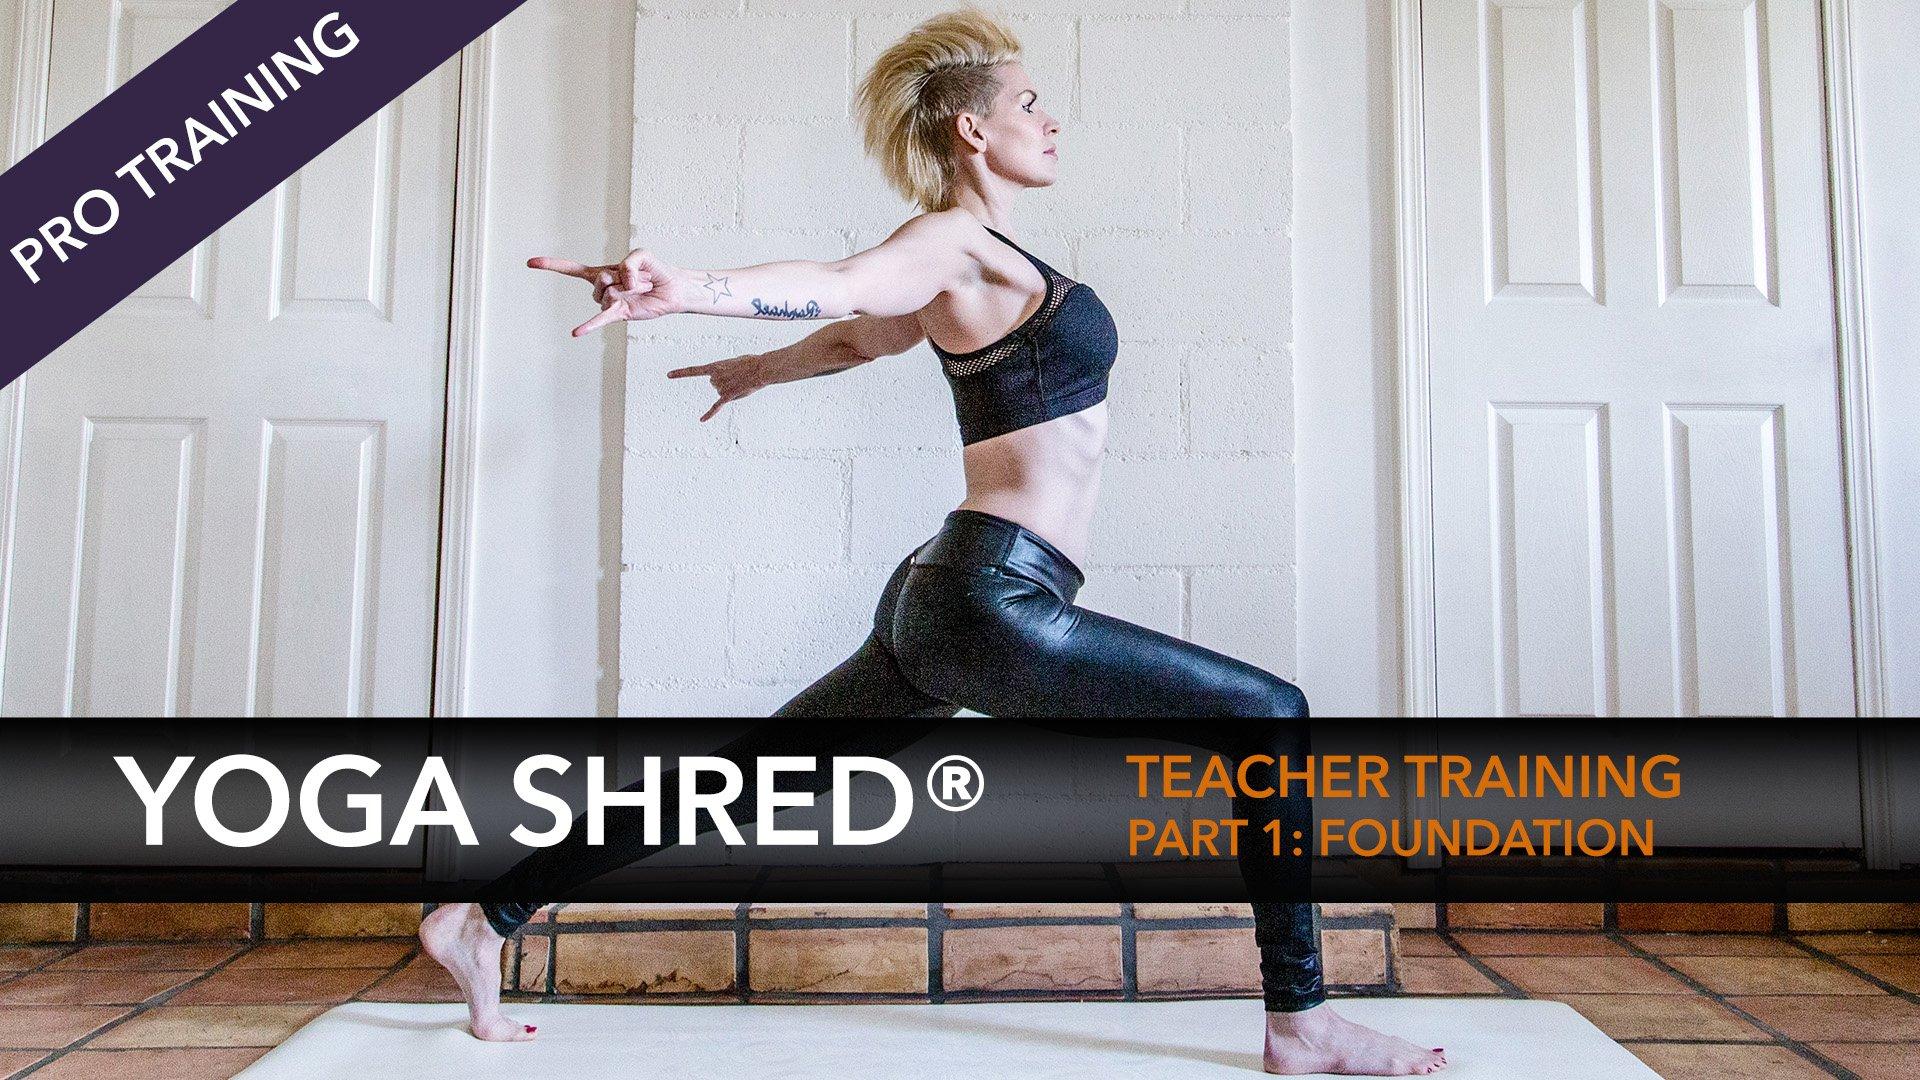 Yoga Shred Teacher Training Part 1 Foundation